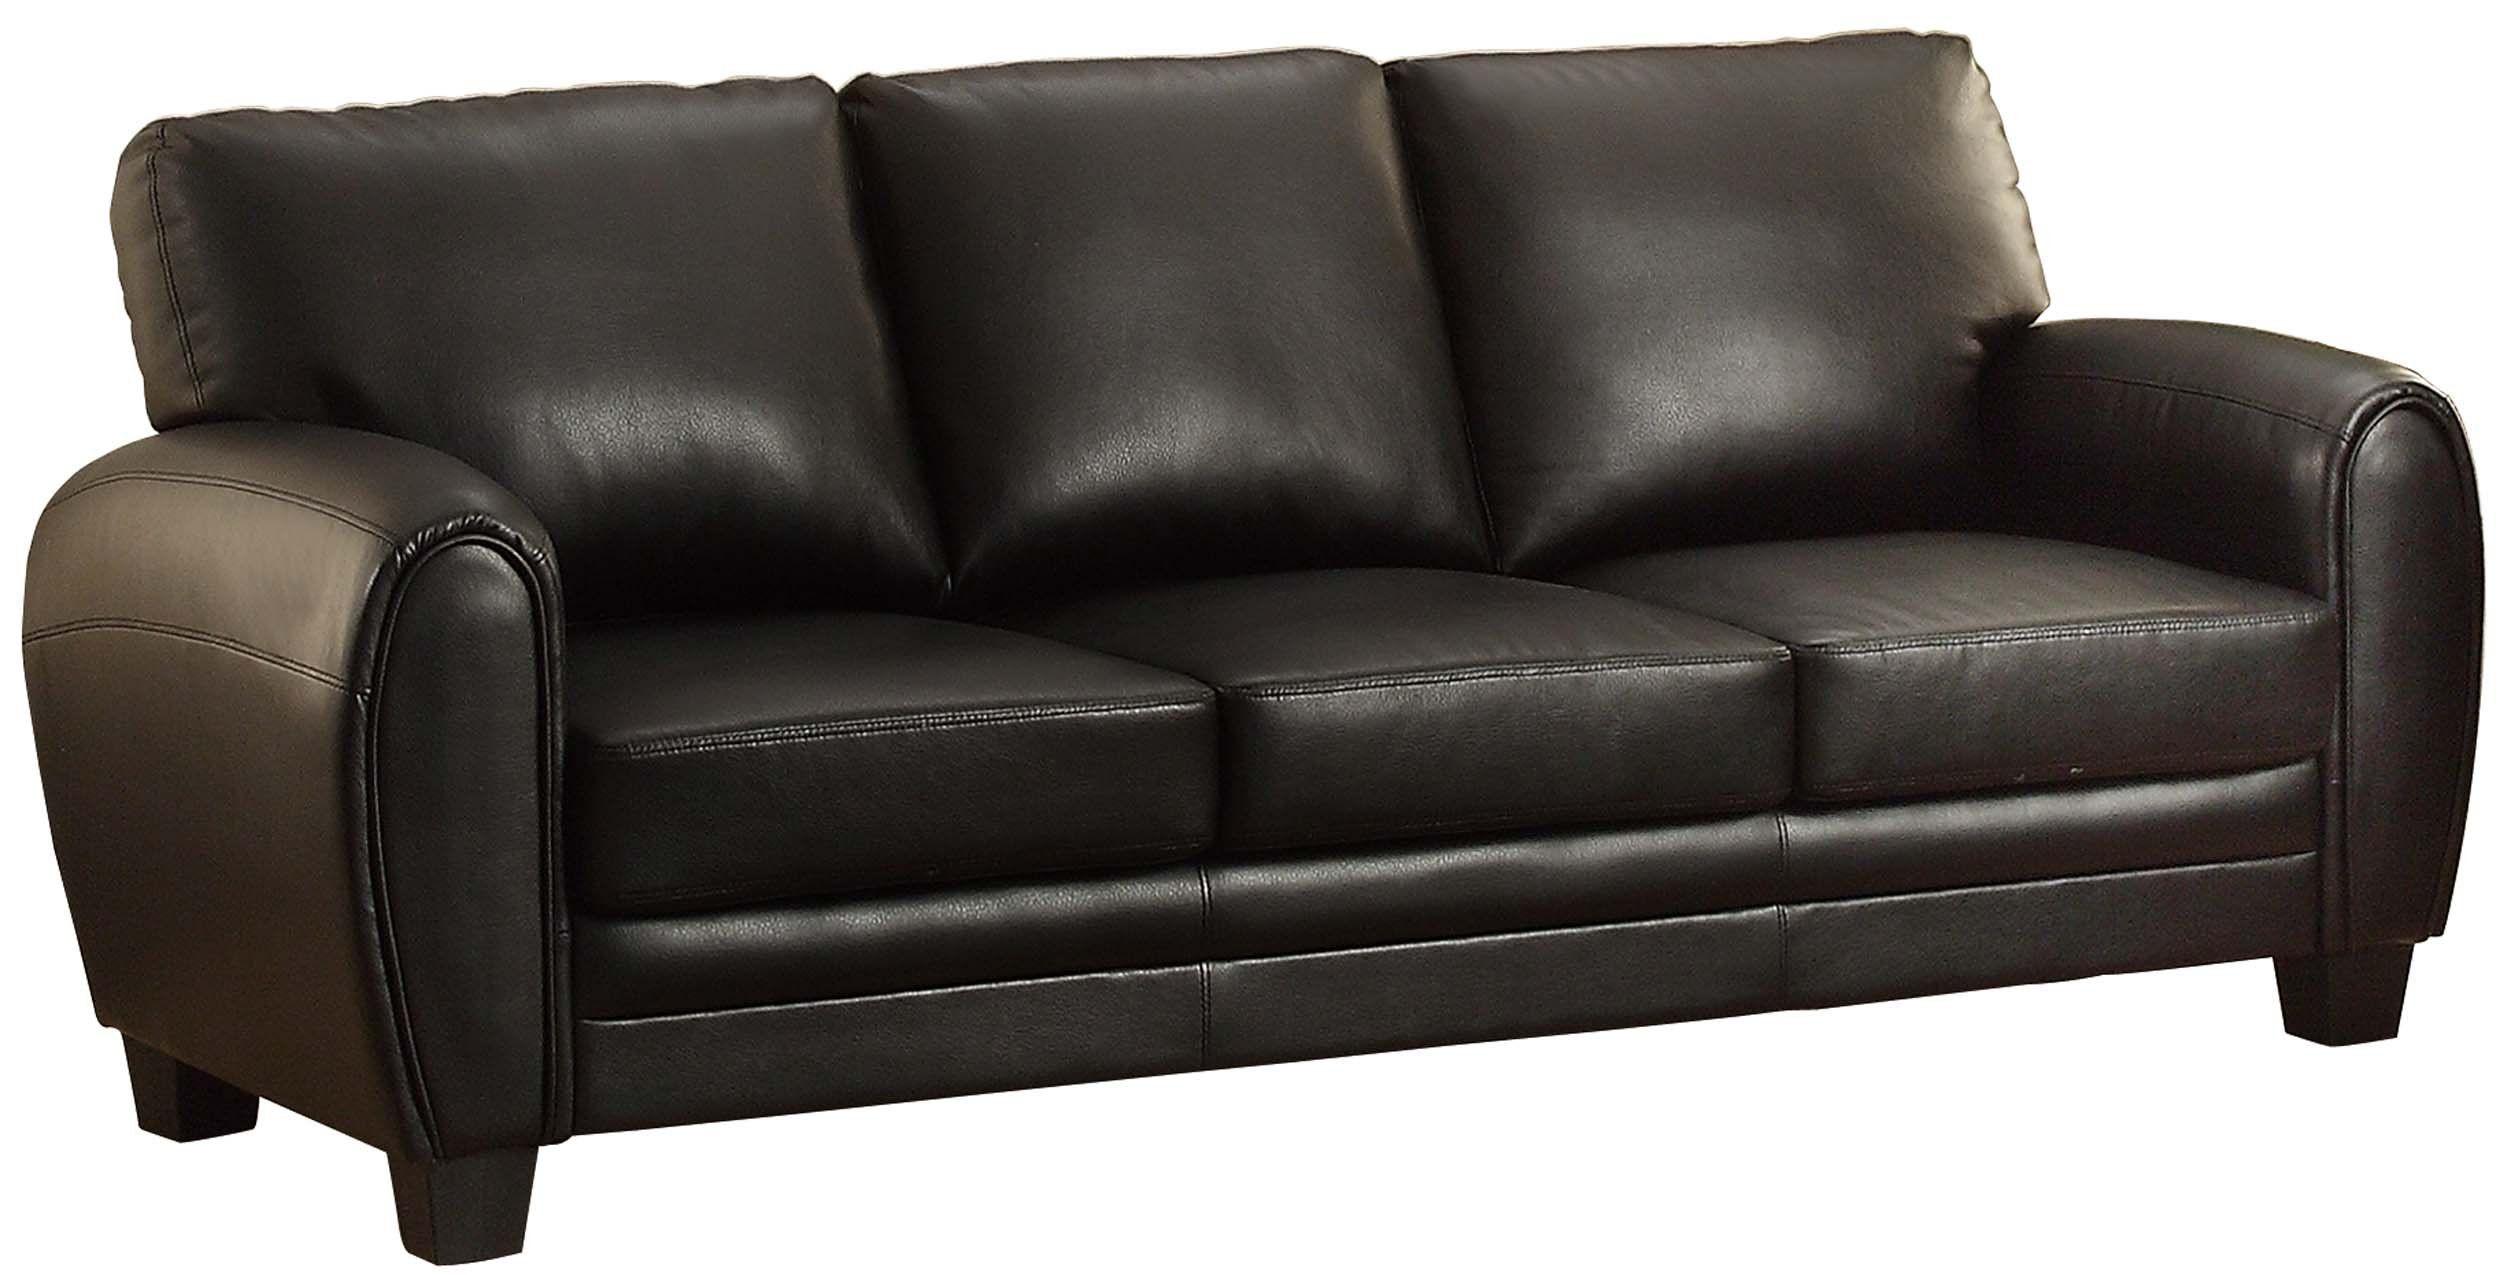 Homelegance 9734bk 3 Upholstered Sofa Black Bonded Leather Match